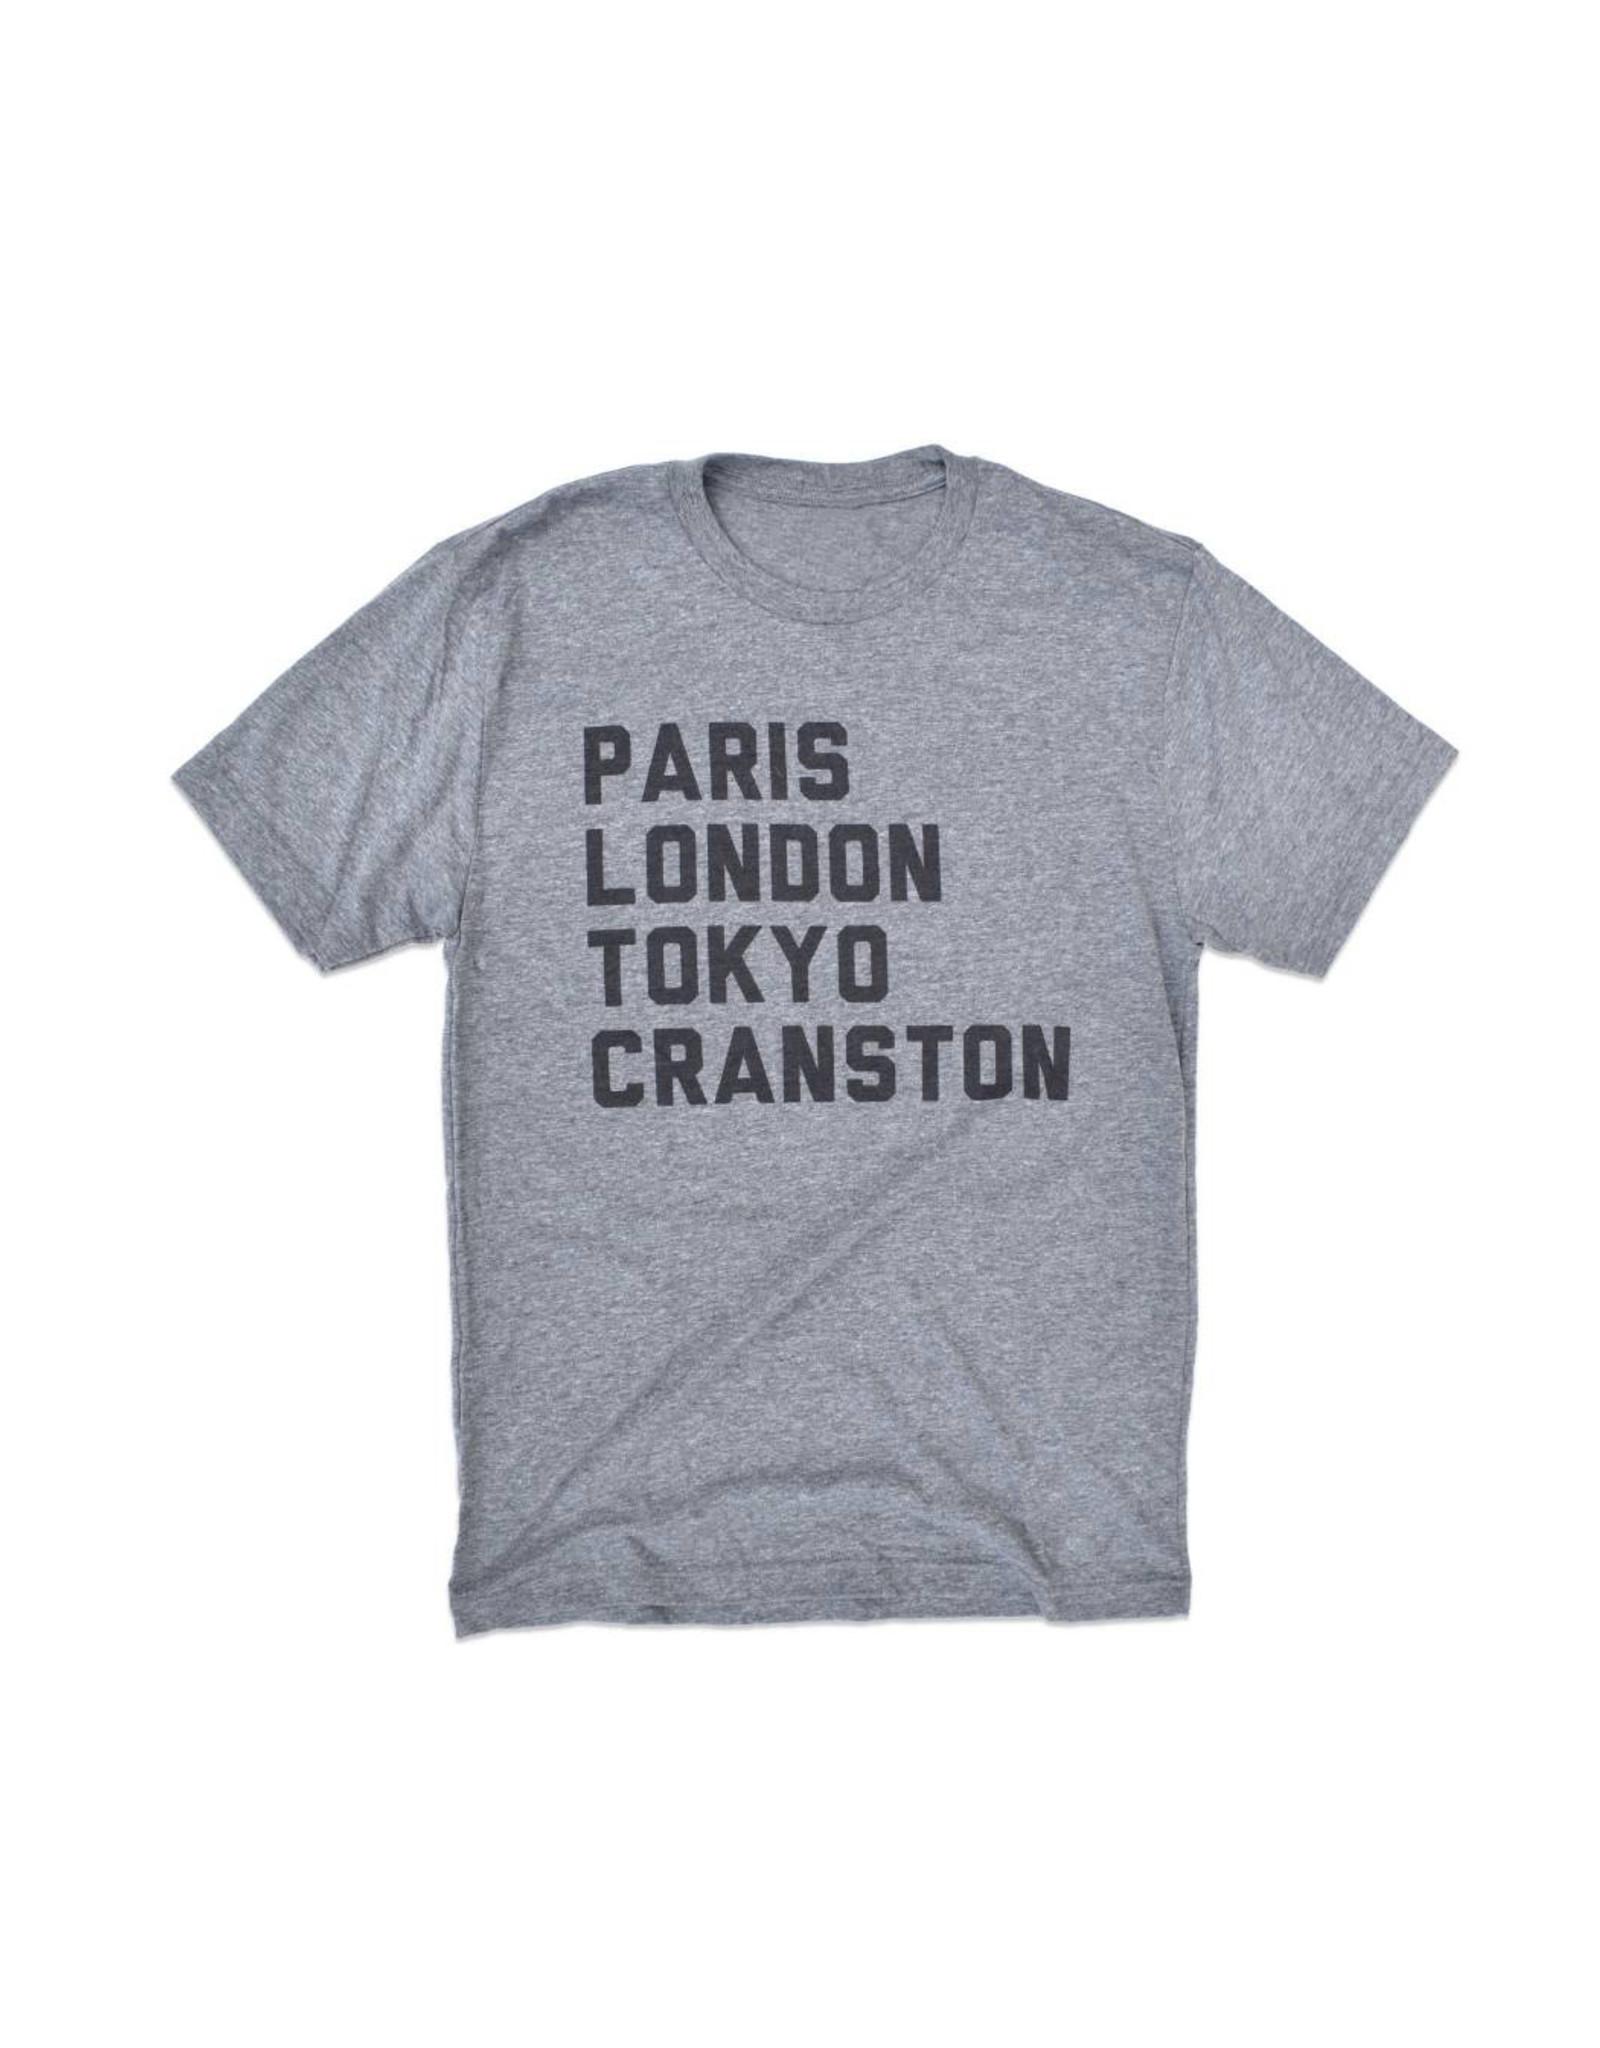 Cranston T-Shirt